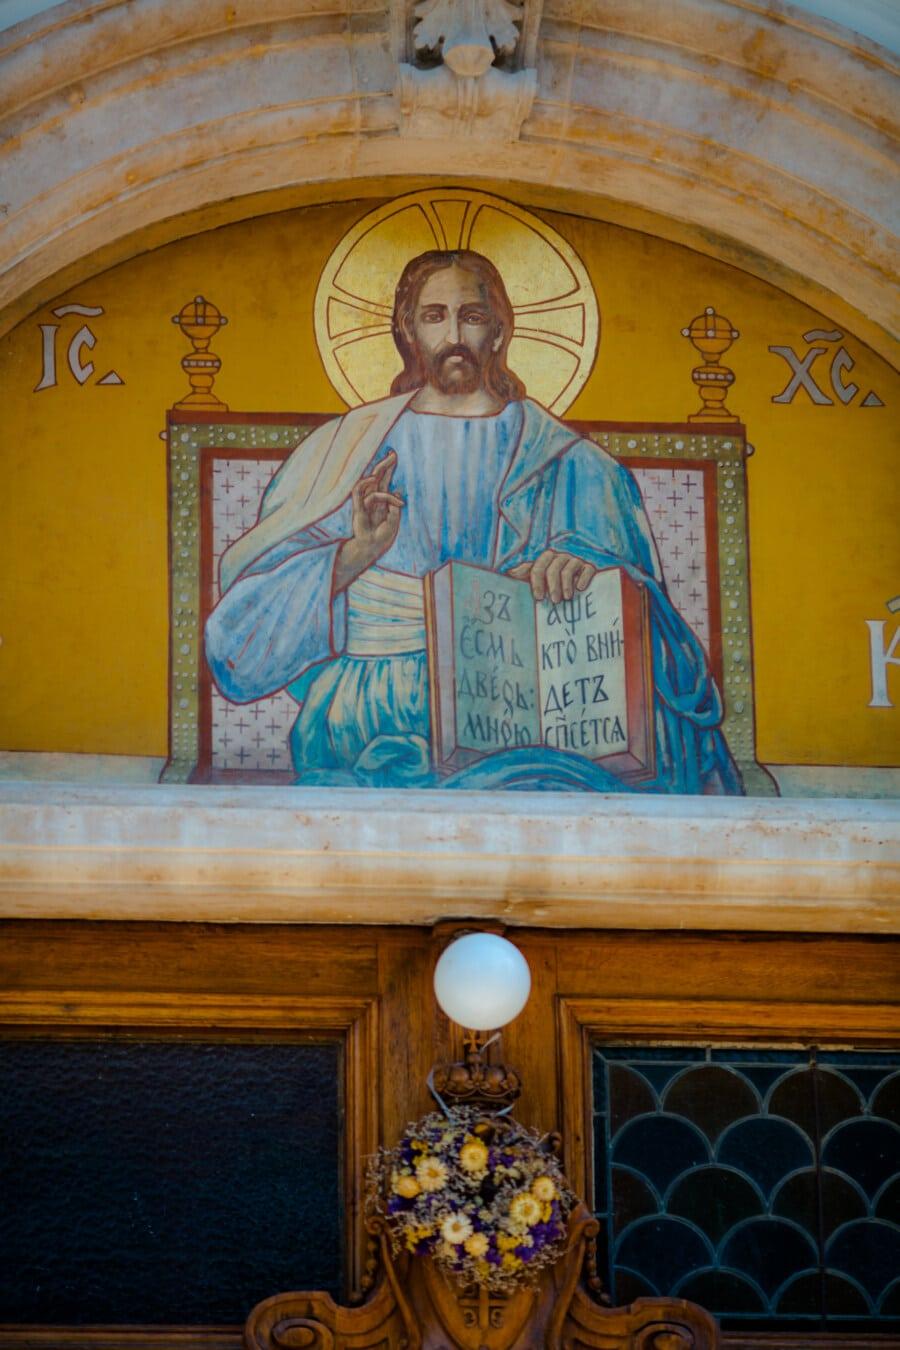 icon, saint, fine arts, Byzantine, orthodox, structure, church, religion, architecture, chapel